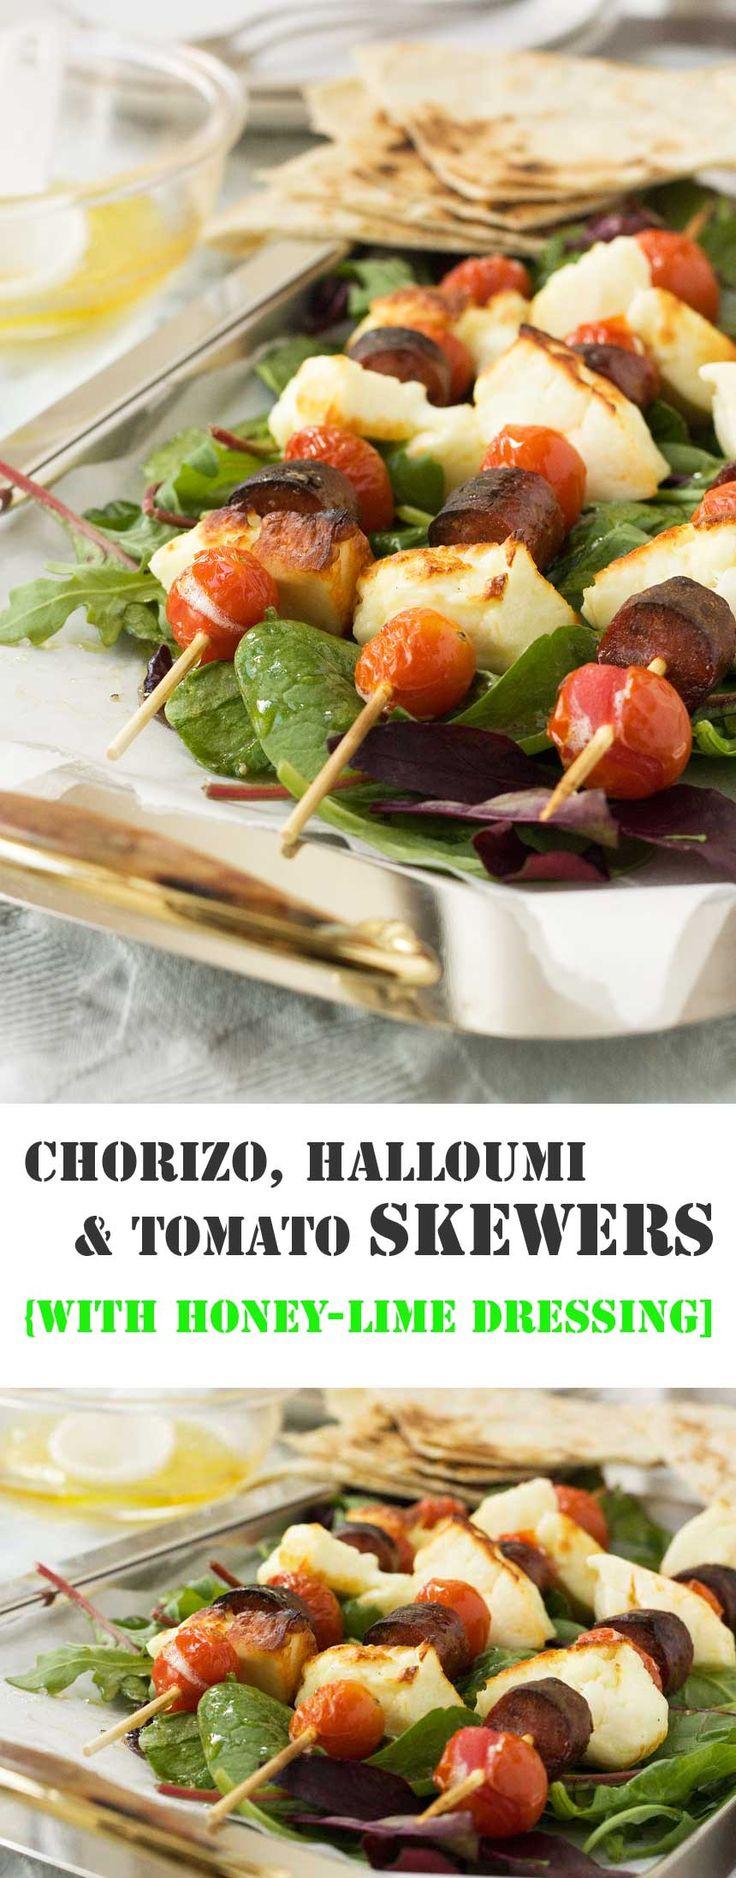 Halloumi, chorizo & tomato skewers                                                                                                                                                     More